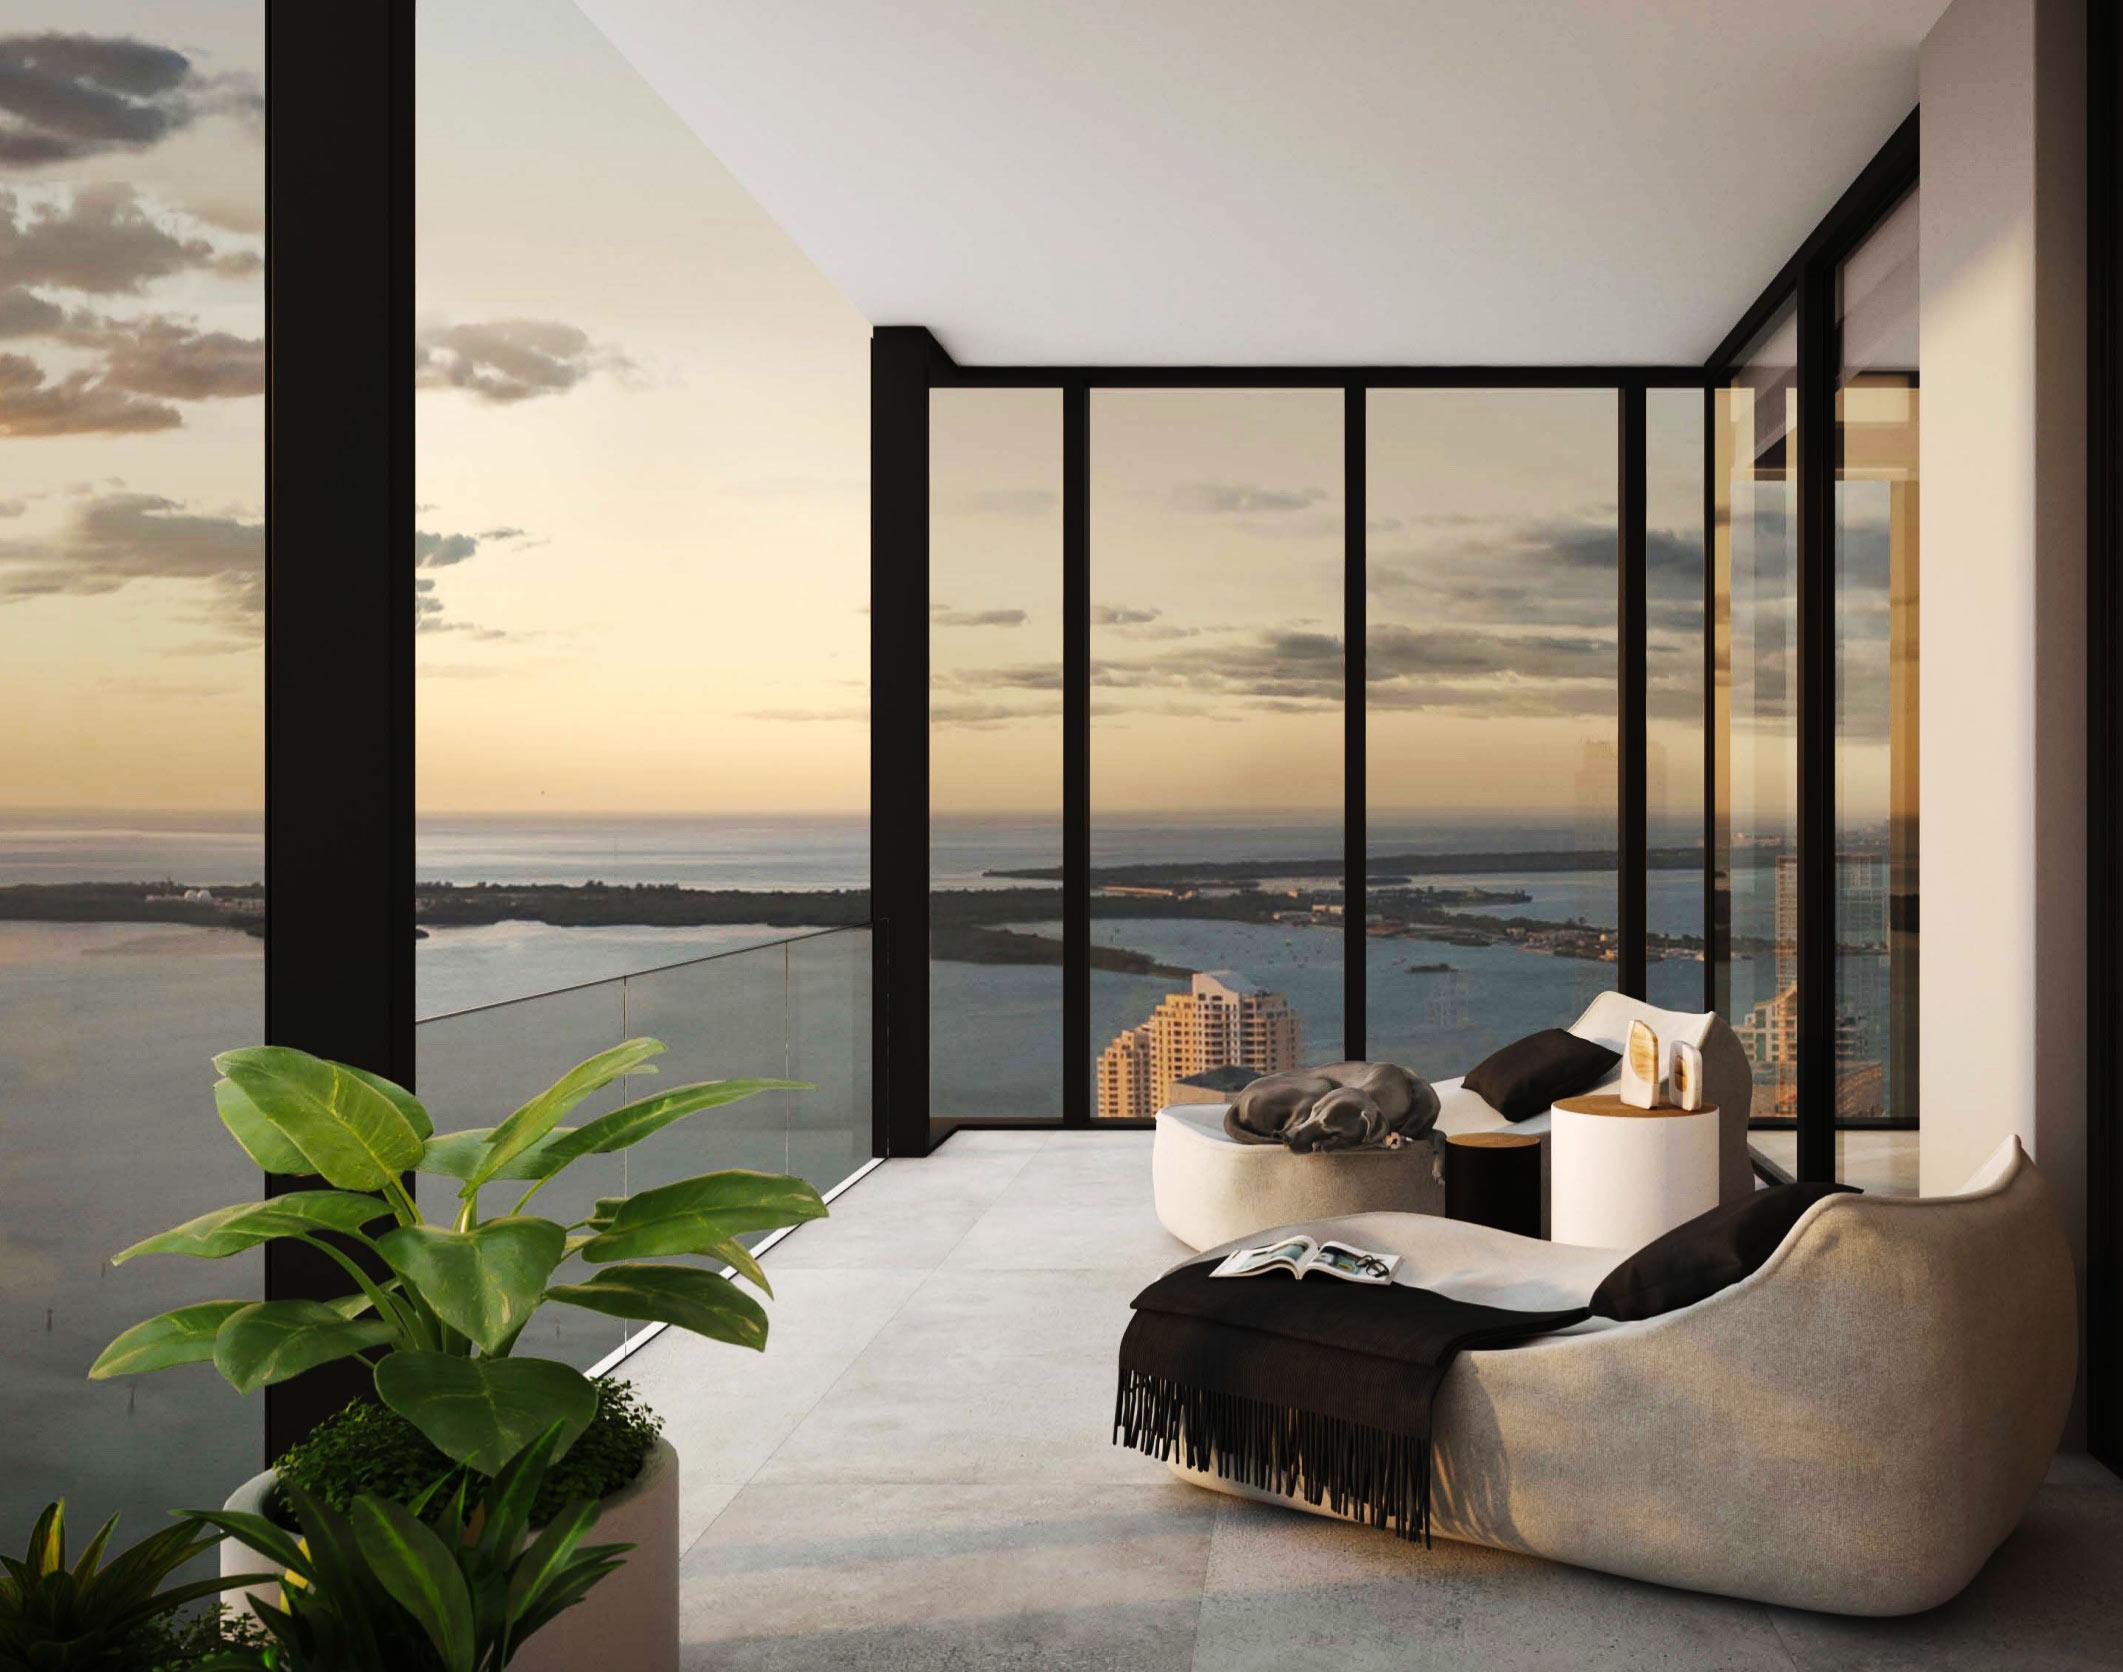 waldorf-astoria-miami-residences-condos-preconstrucion-florida-market